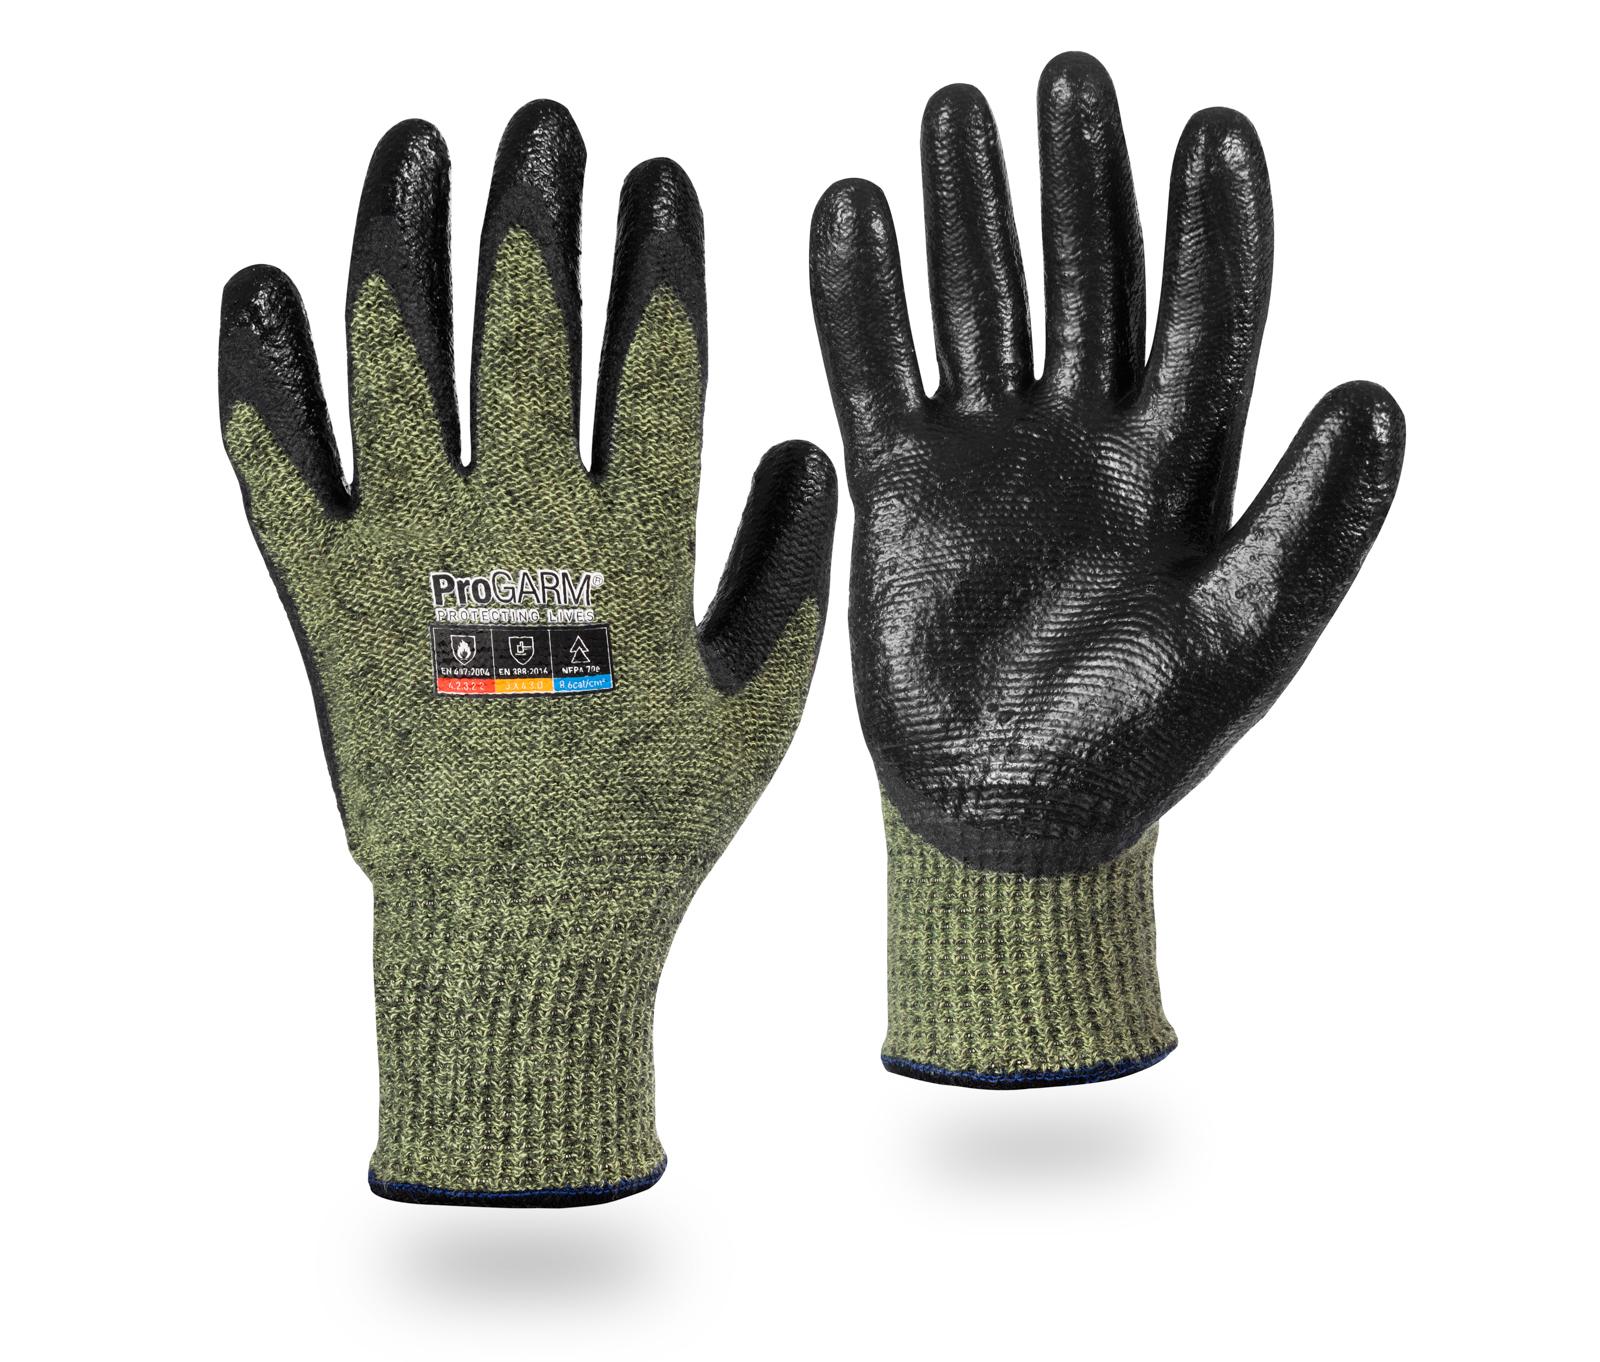 Progarm 2700 Arc Flash Gloves